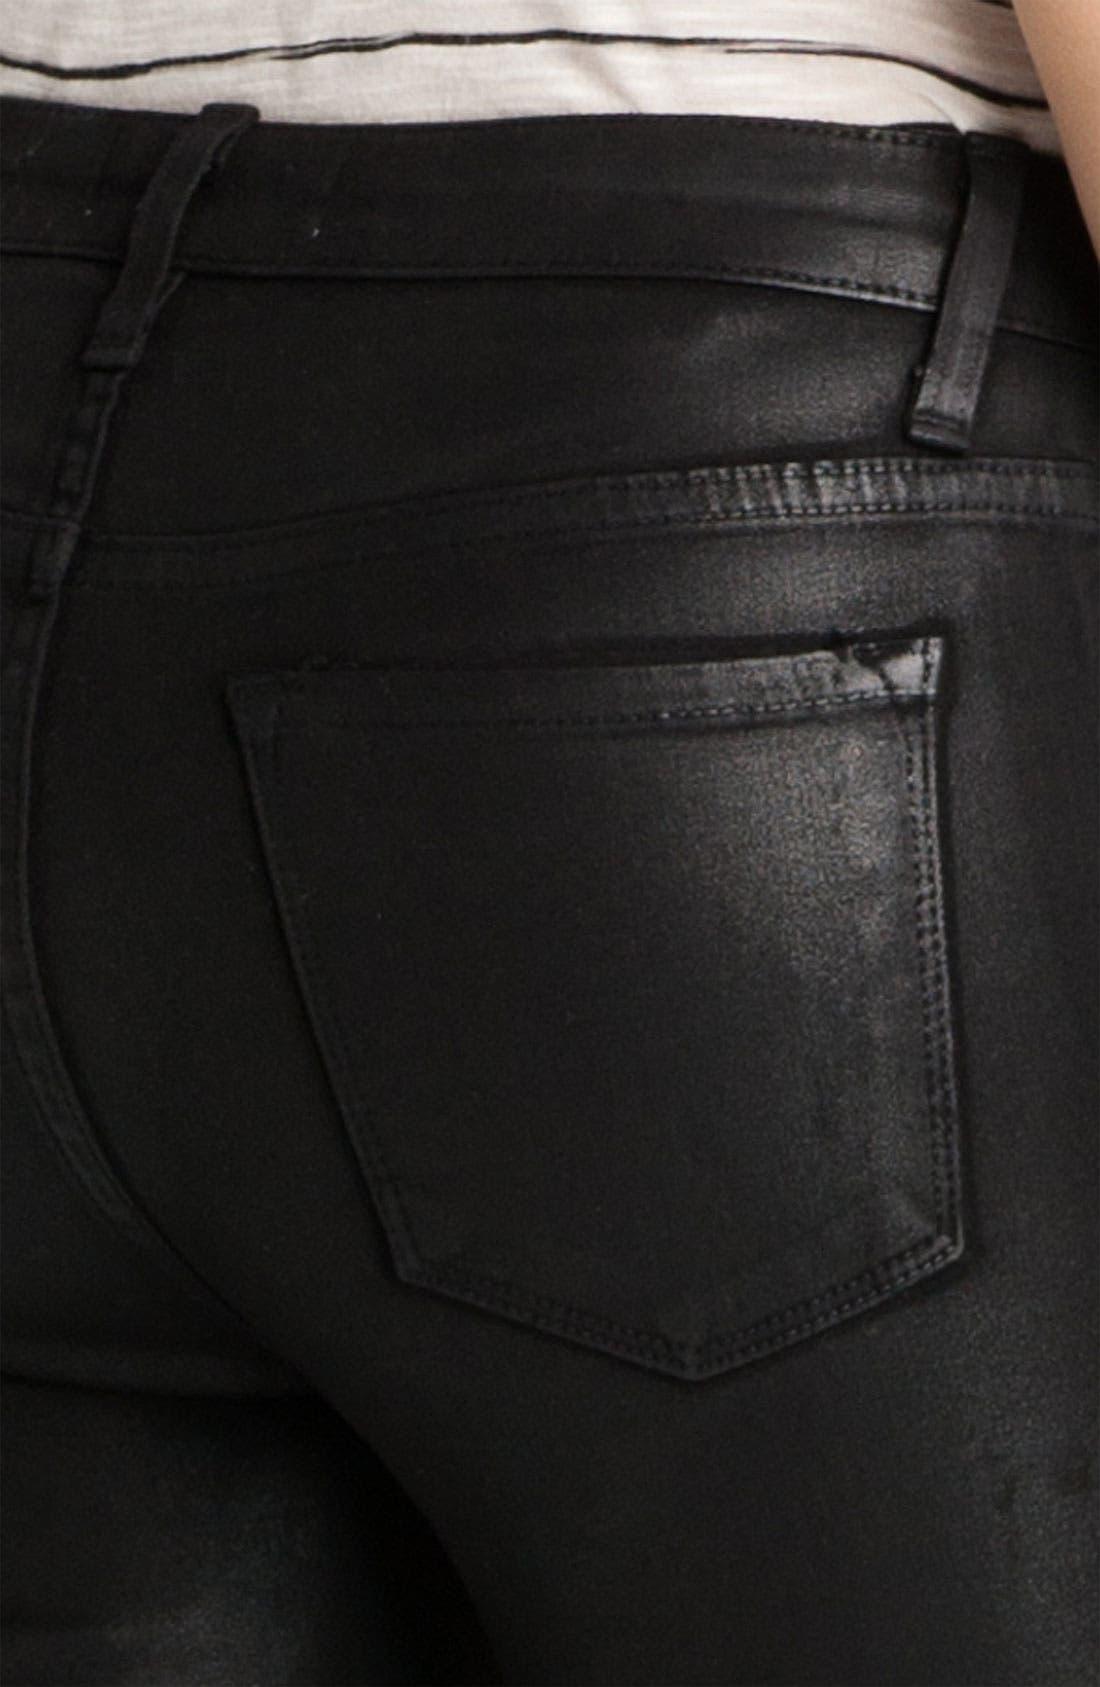 S & G, Sarah & George Coated Denim Jeans, Alternate thumbnail 2, color, 001